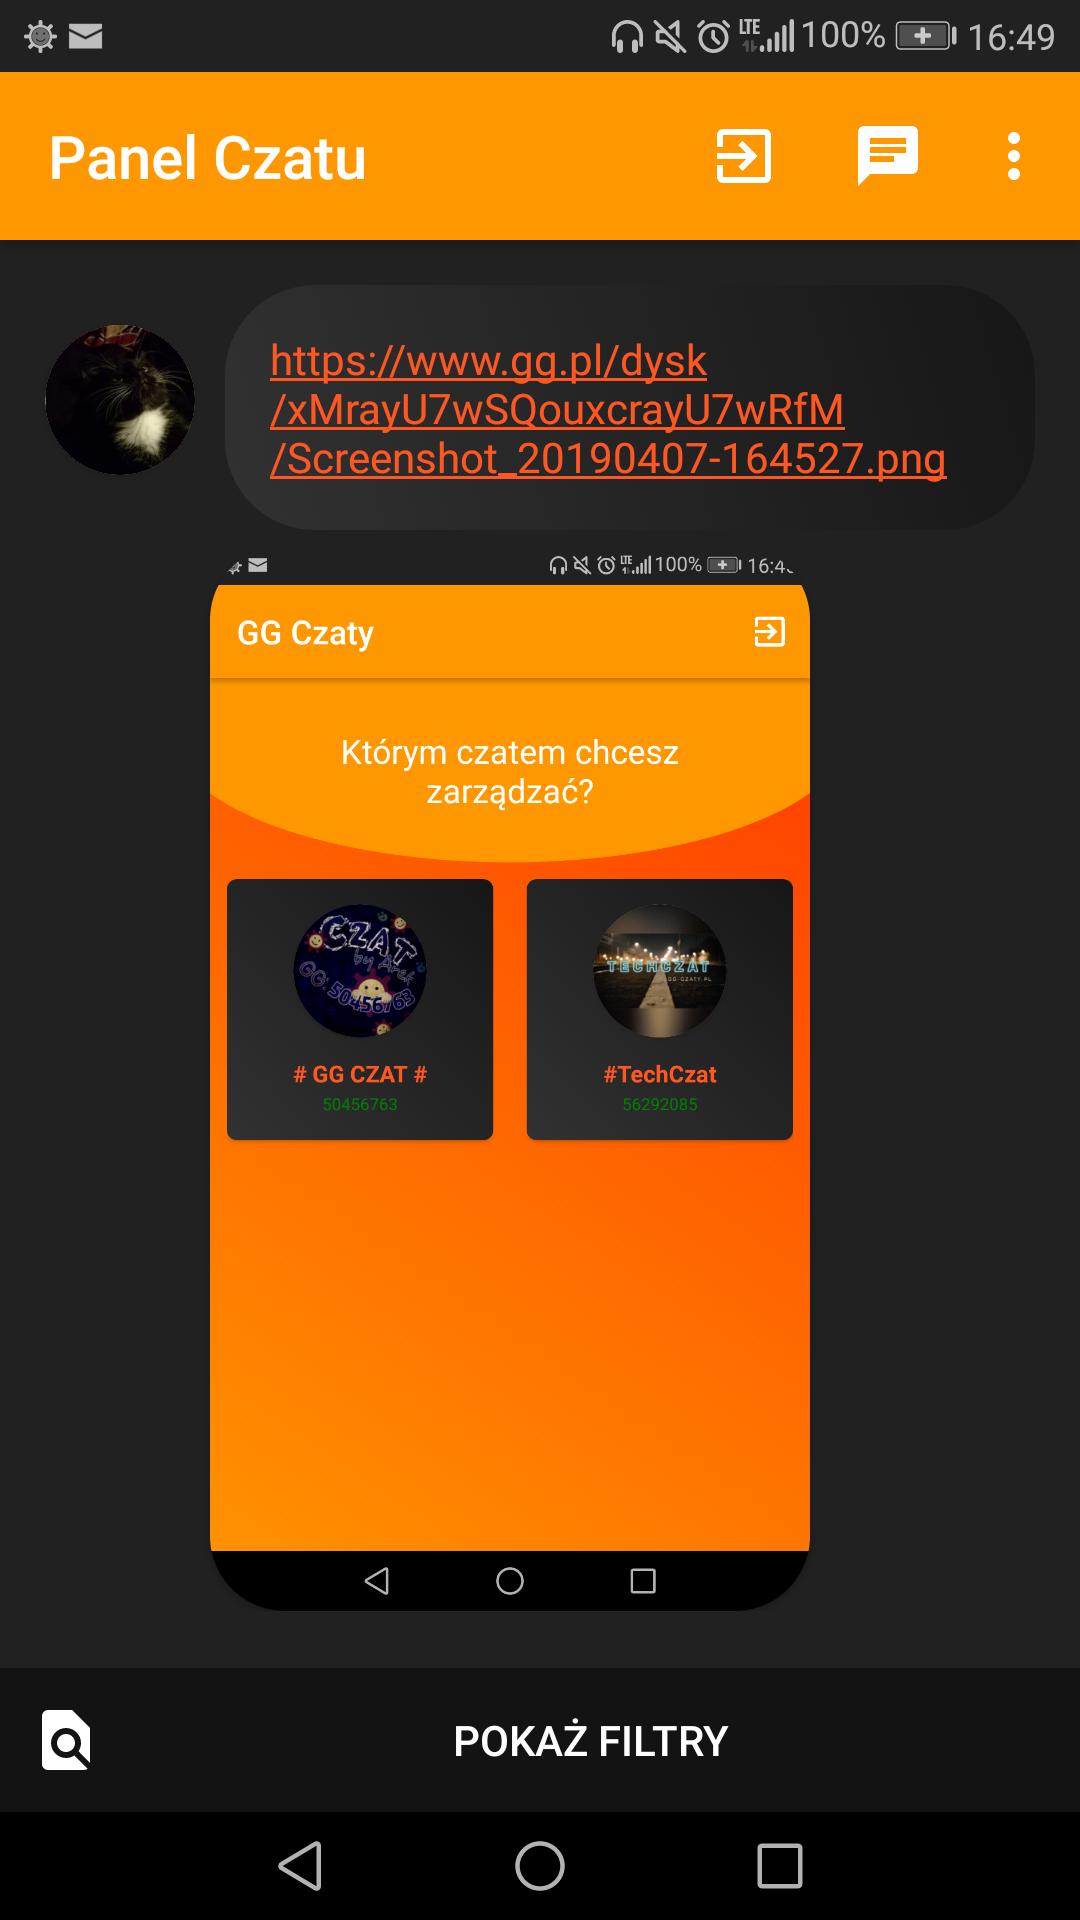 Screenshot_20190407-164925.png